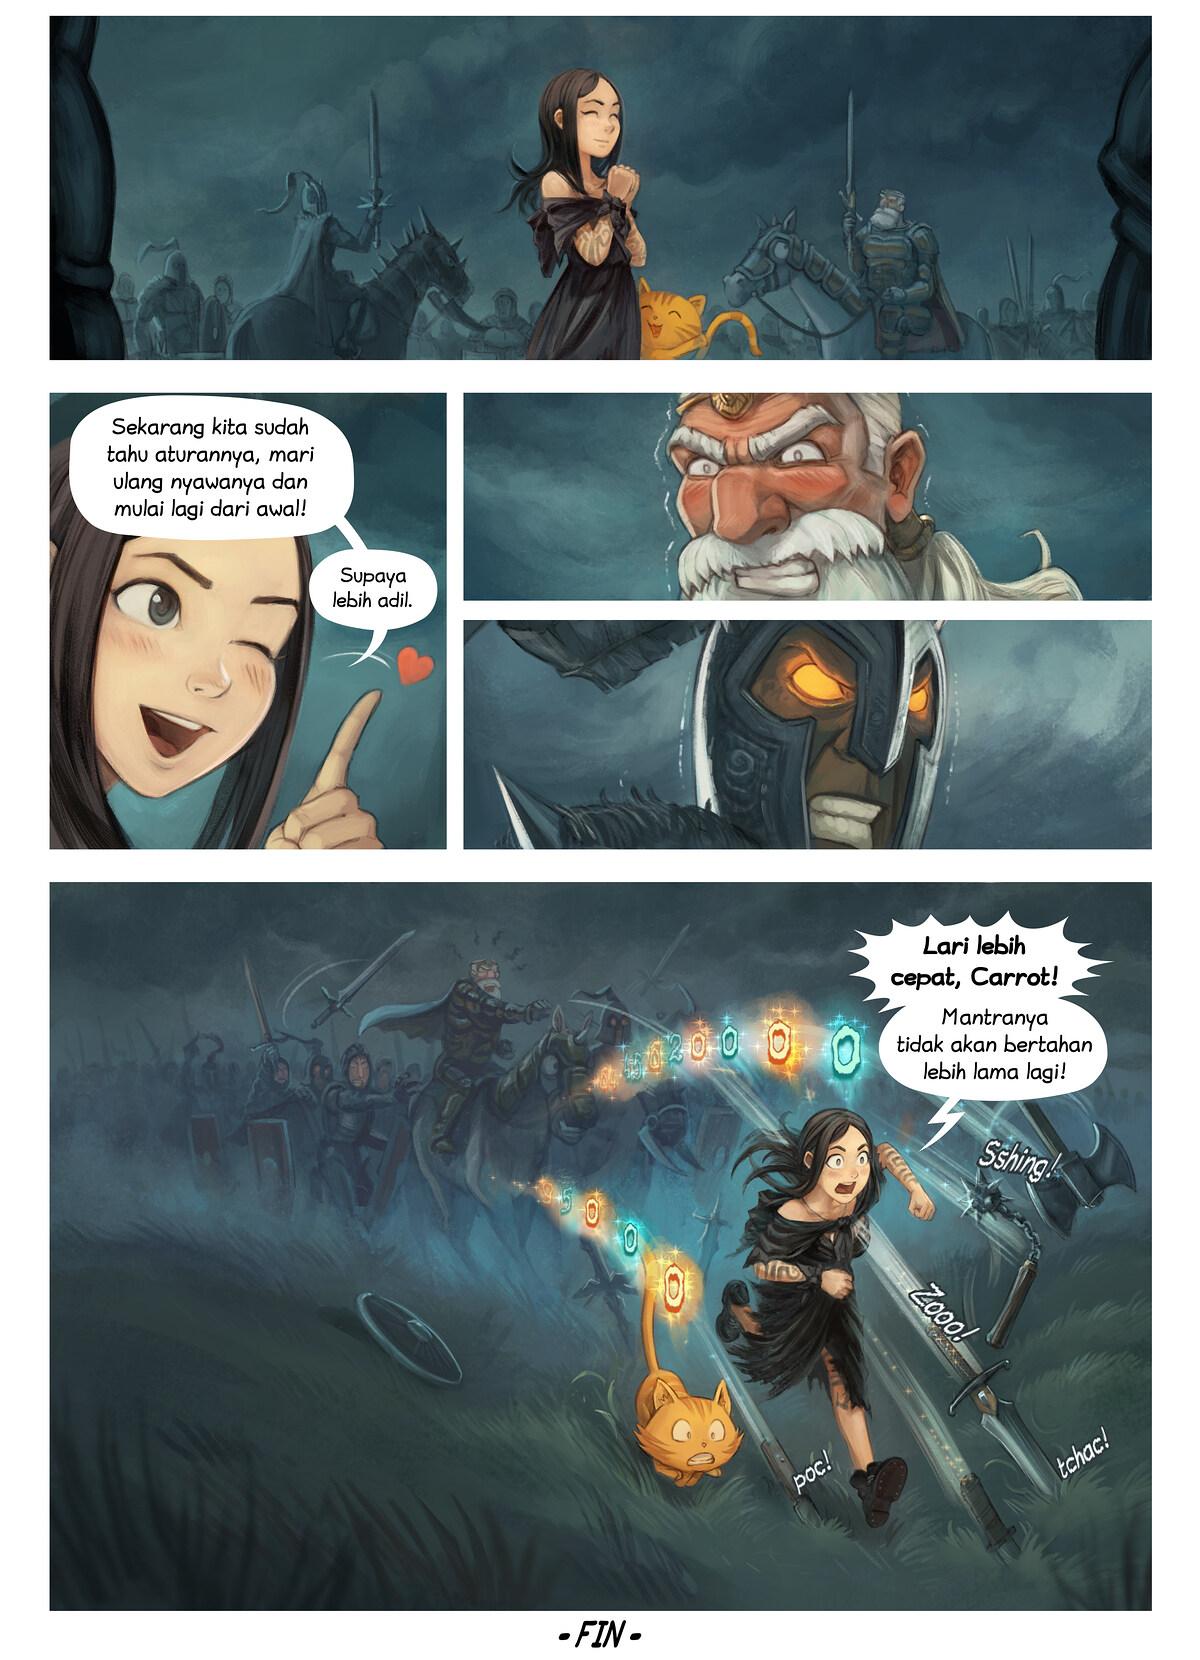 Episode 33: Mantra Perang, Page 8